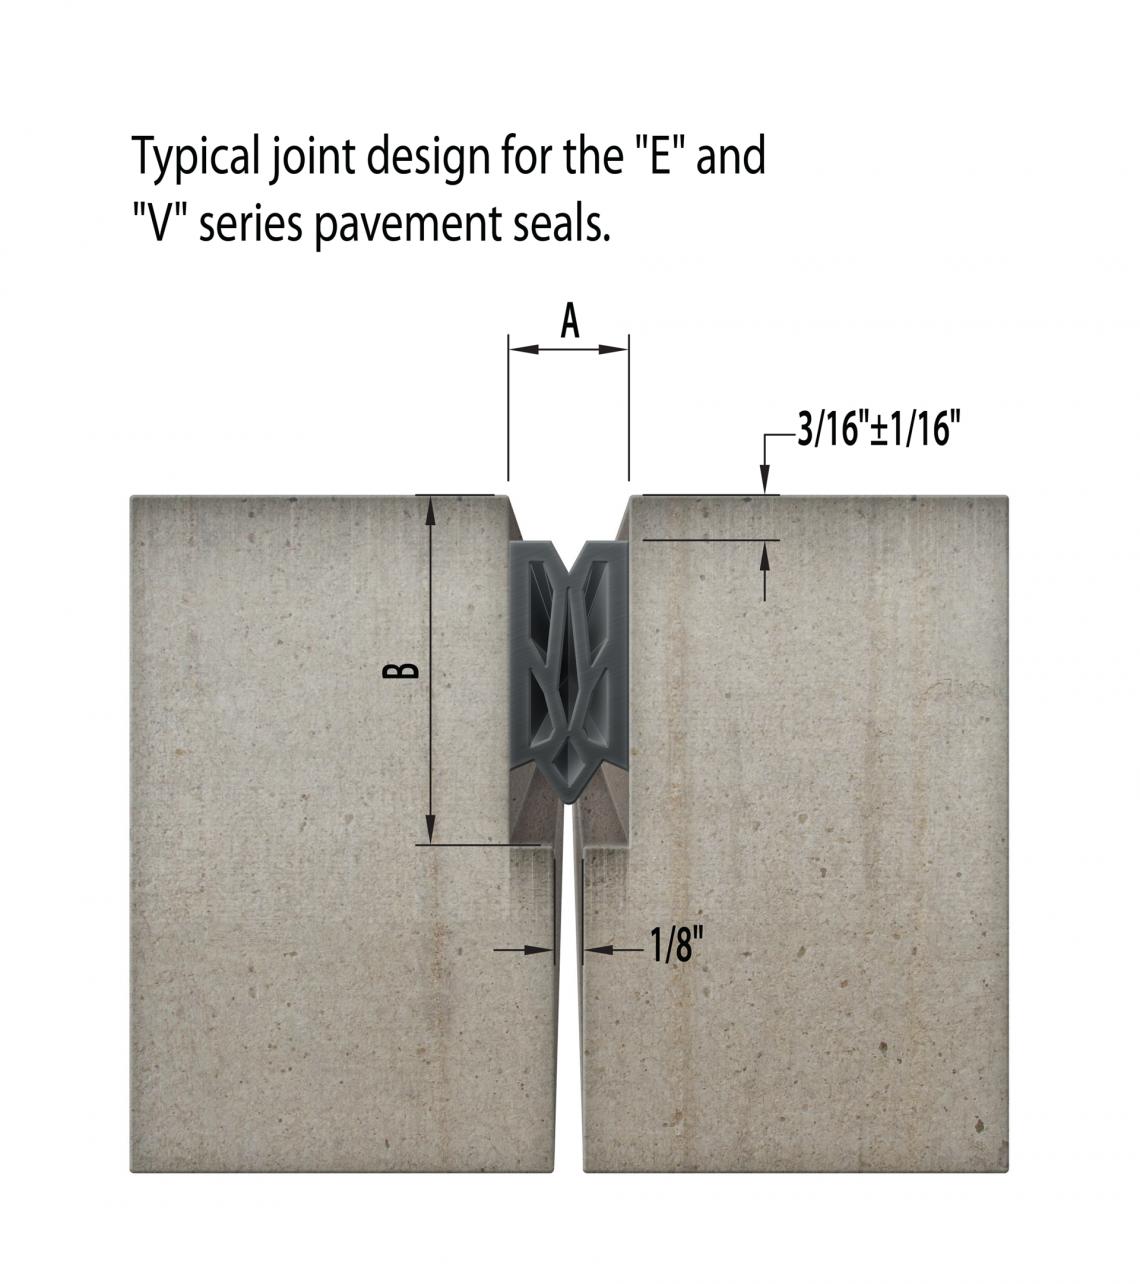 Bridge Expansion Joint Design Cutaway Image